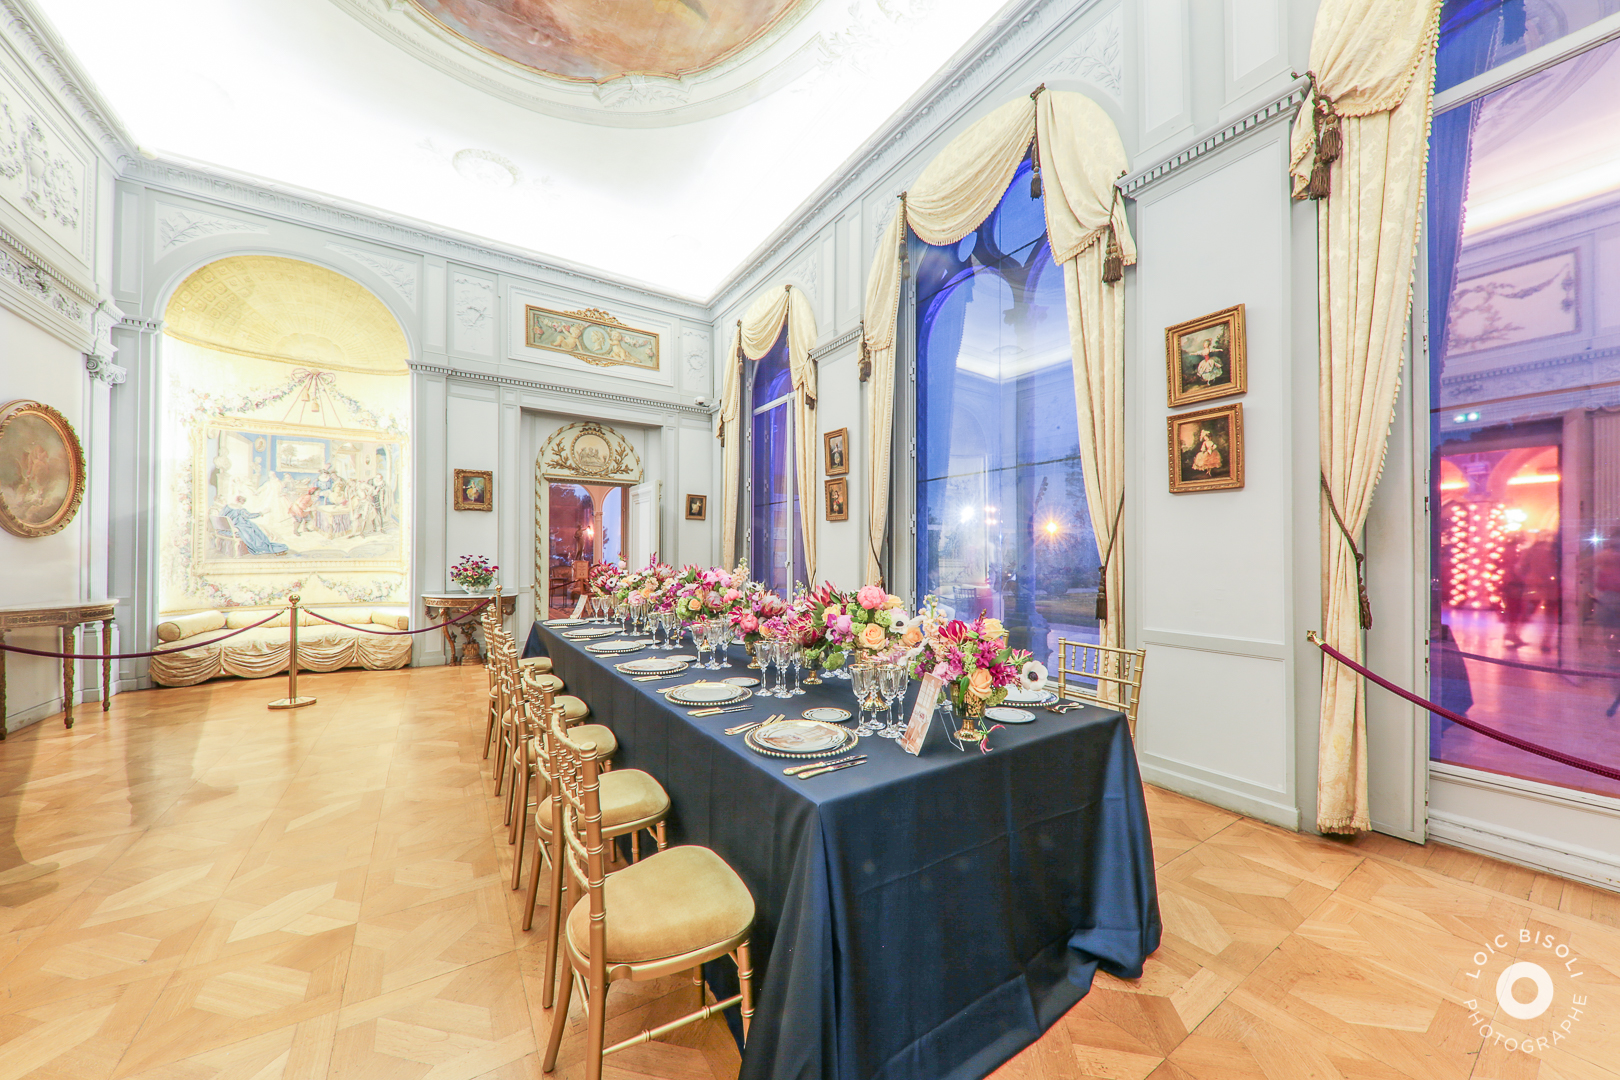 aucop-Villa Ephrussi de Rothschild-Studio Loic Bisoli-lumieres-mur-facade-nice-soiree-saint jean cap ferrat-event